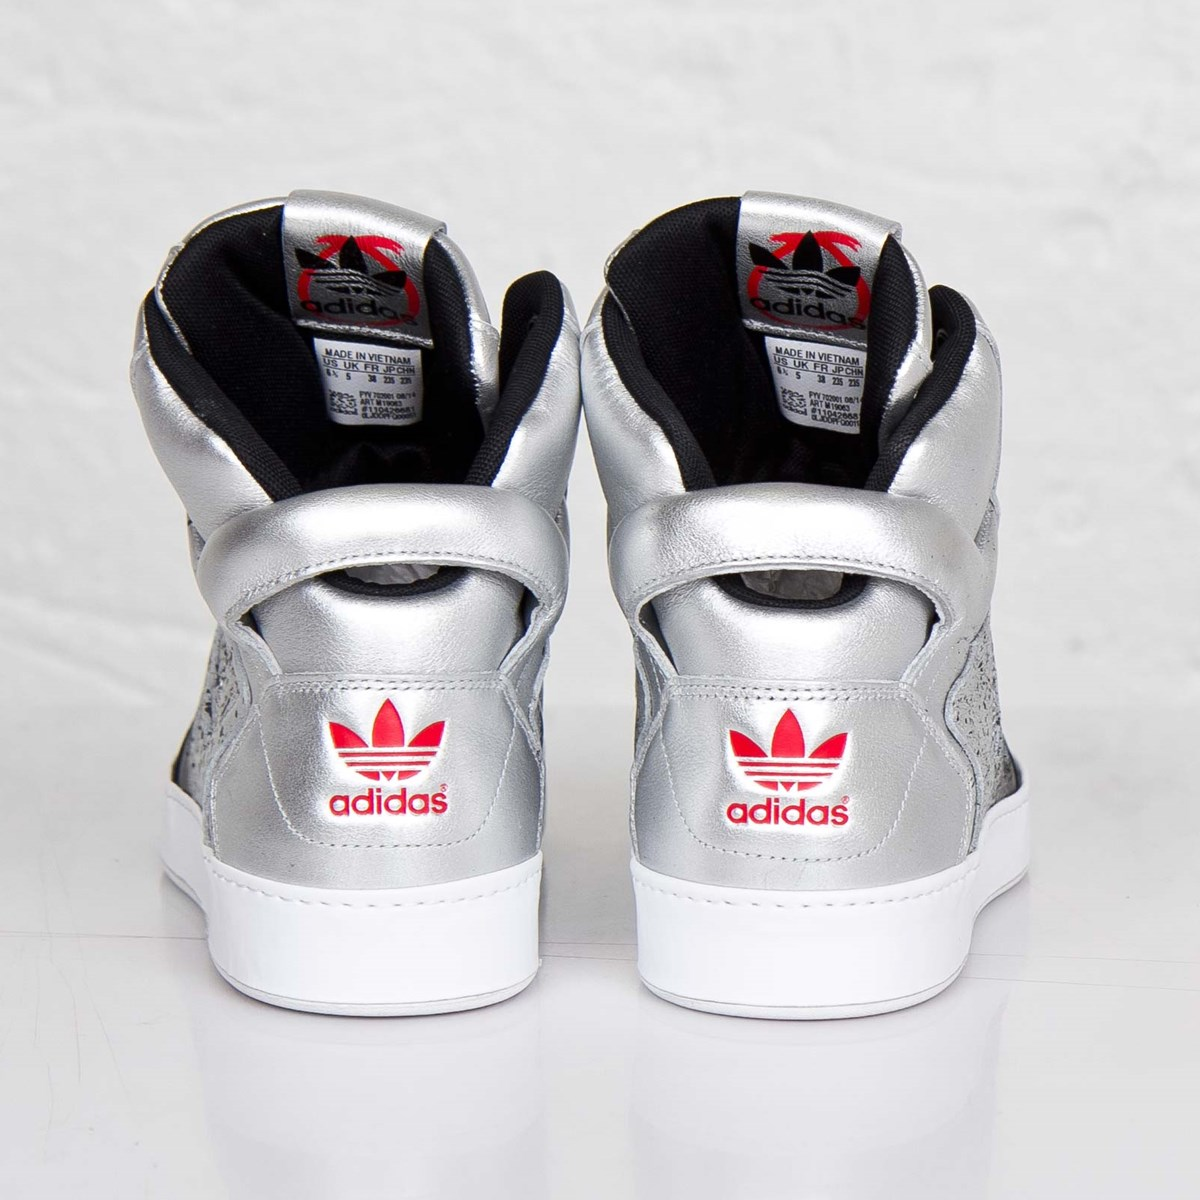 brand new 2eded ede0a adidas Bankshot 2.0 W - M19063 - Sneakersnstuff  sneakers  streetwear  online since 1999